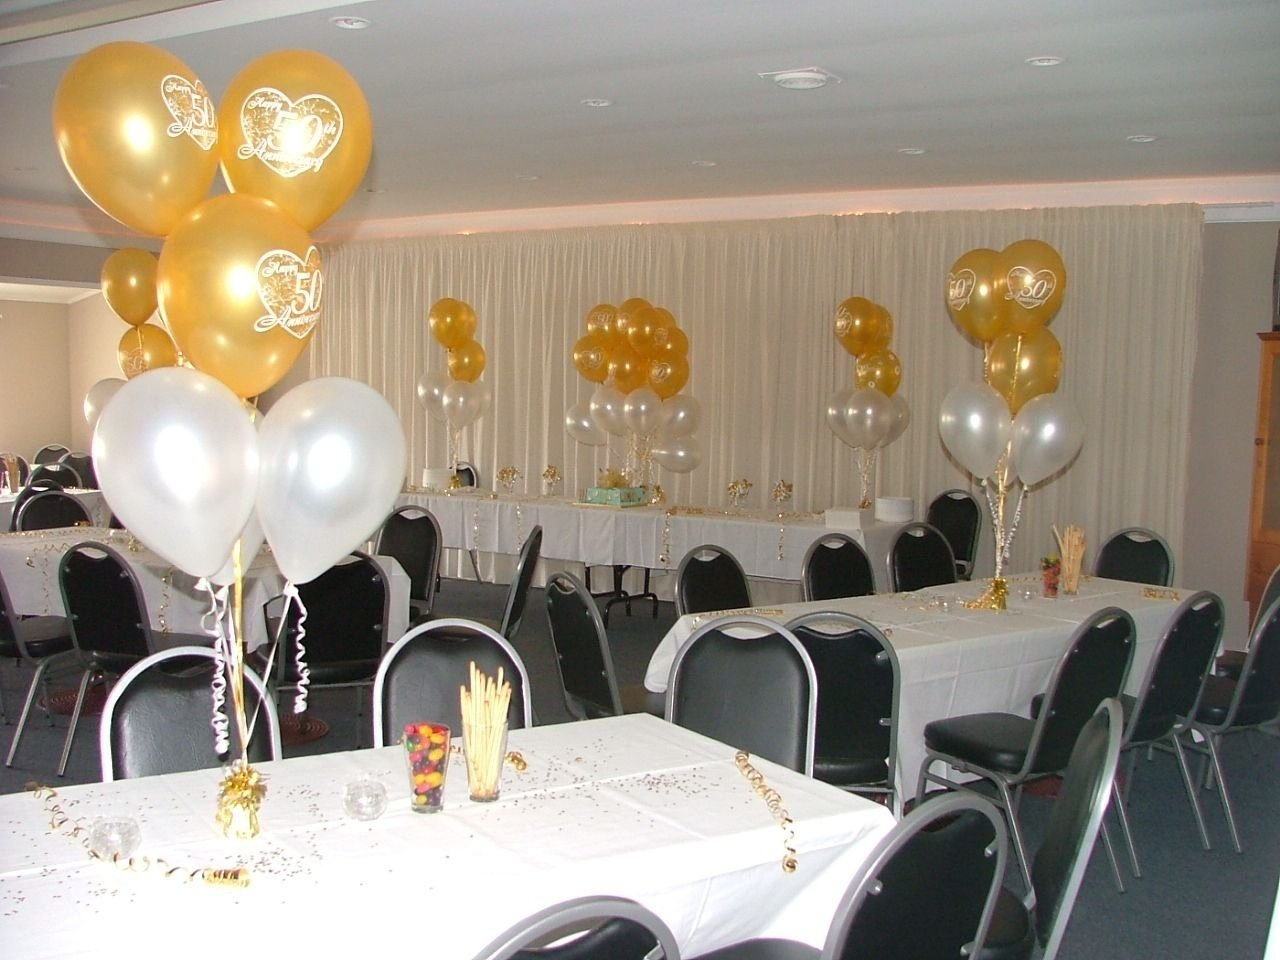 wedding decorations | wedding decorations ideas anniversary